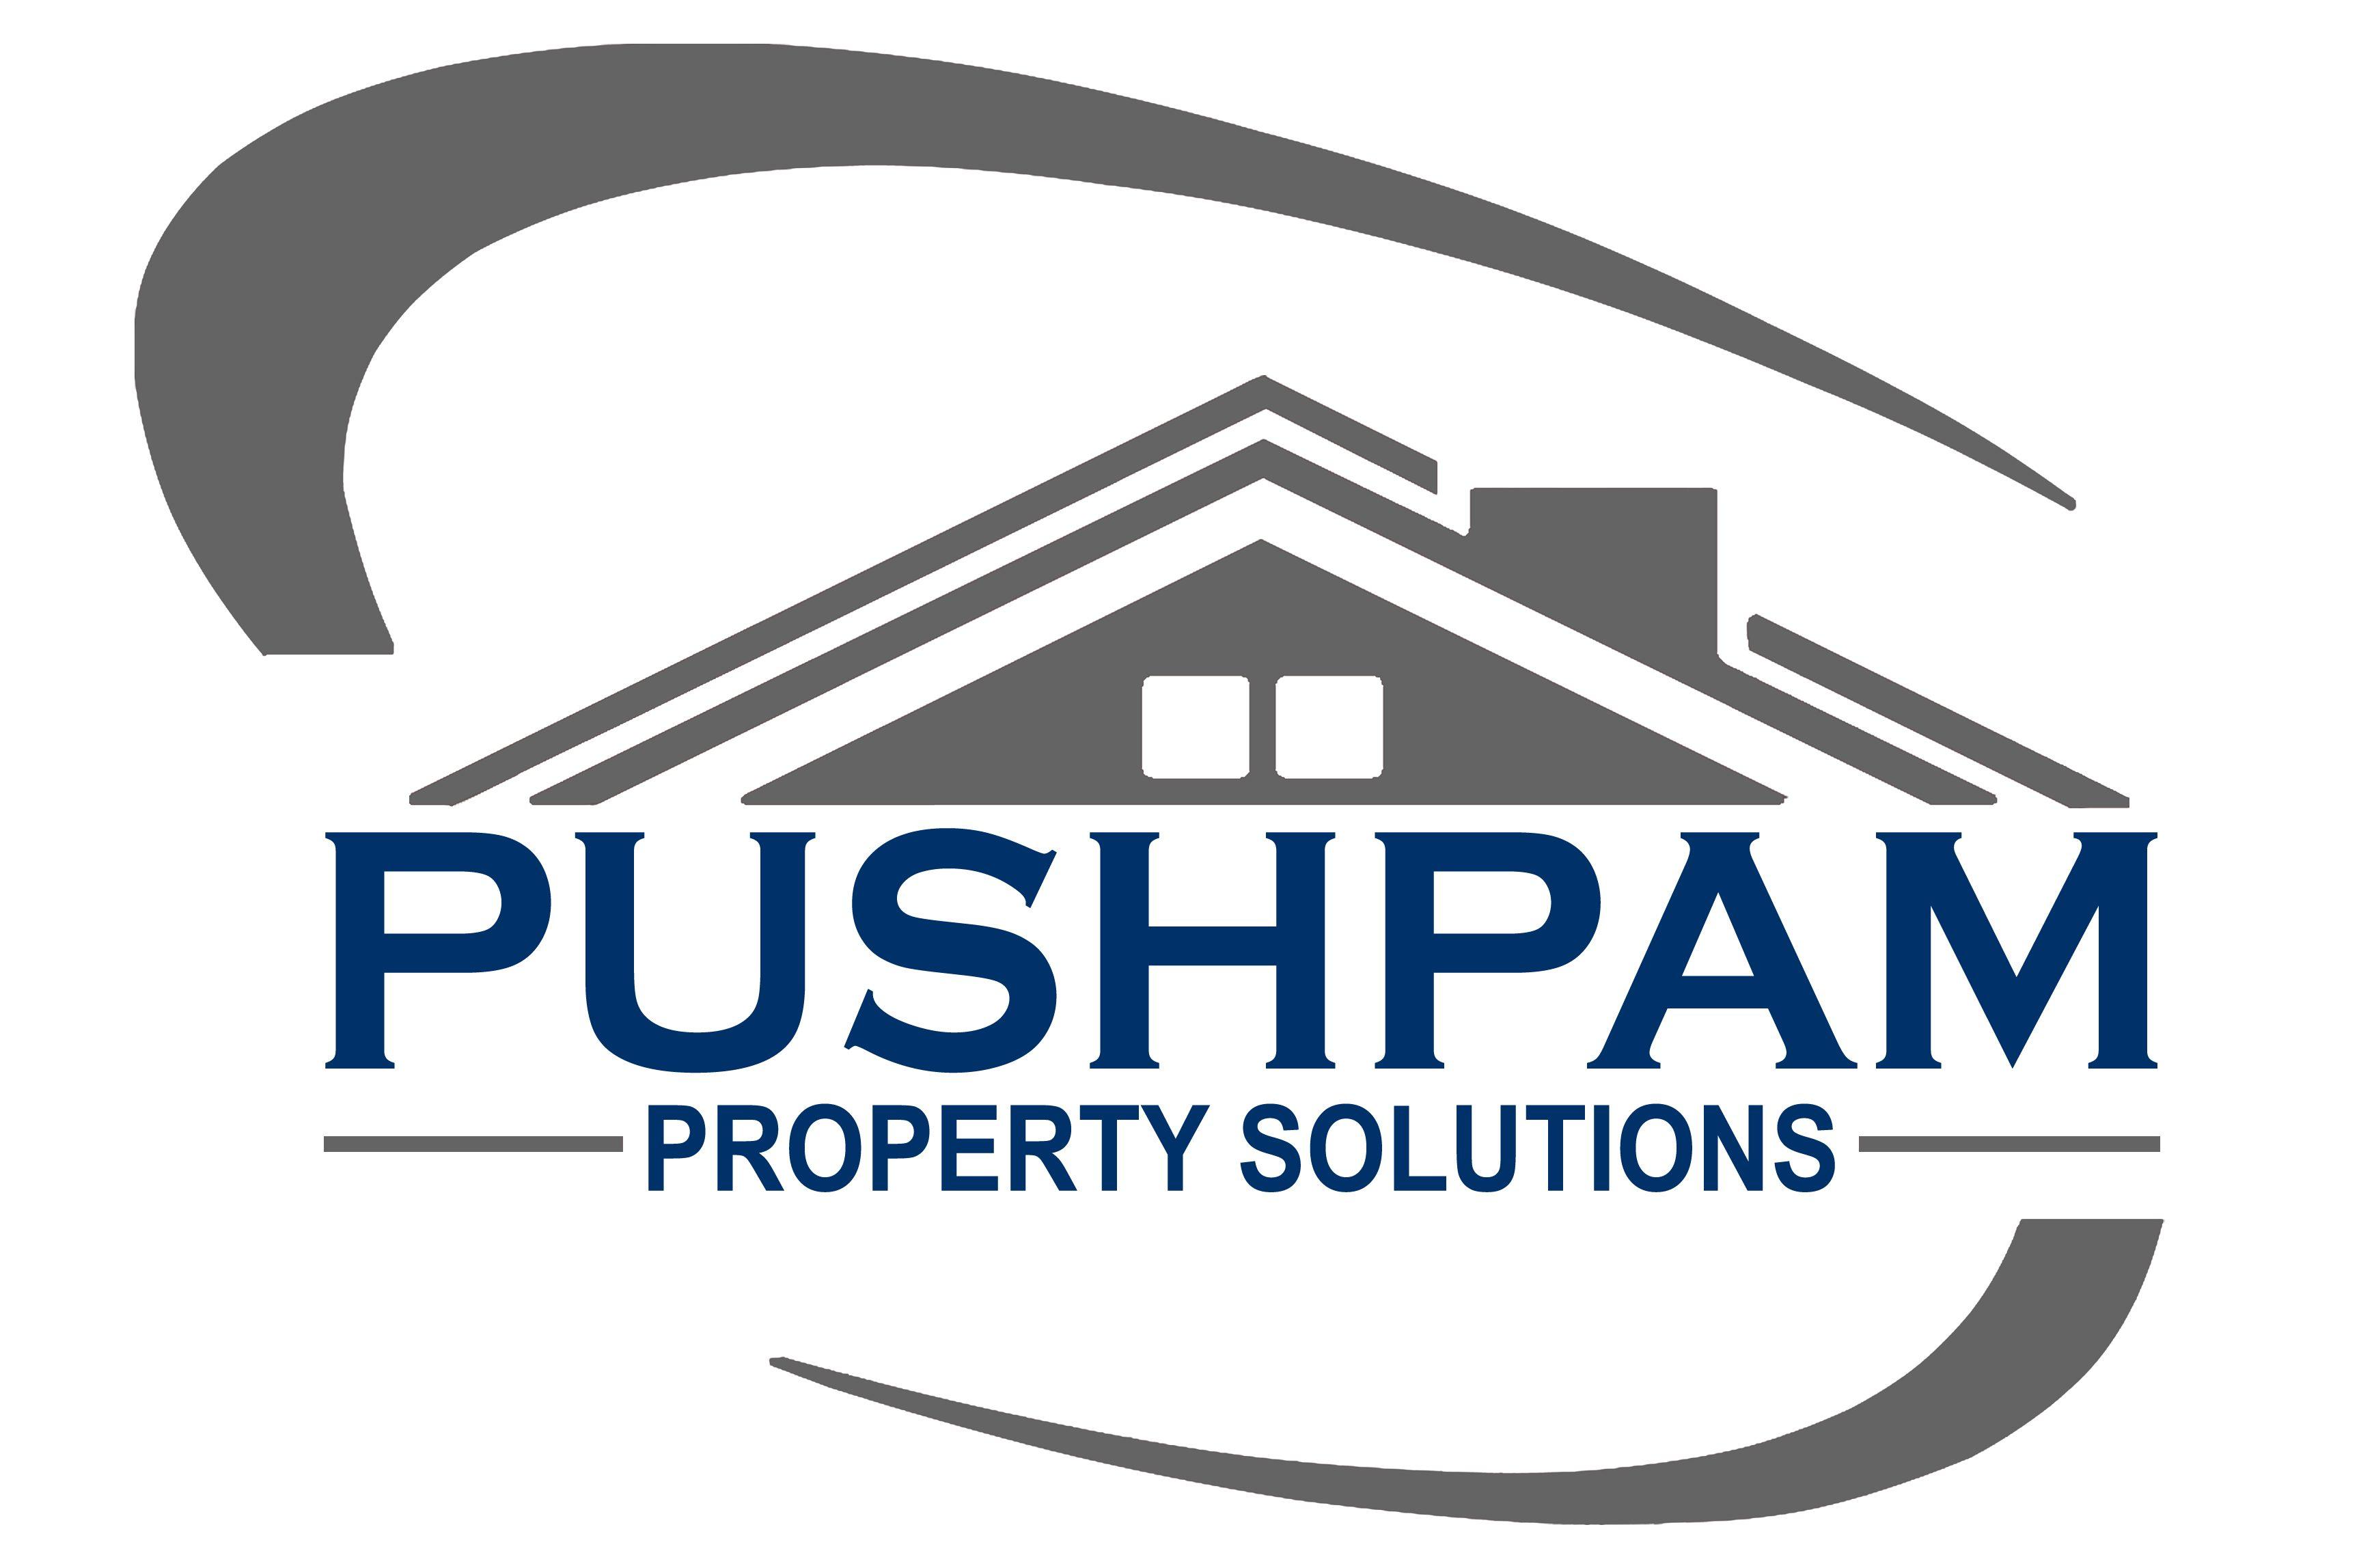 Pushpam Property Solutions